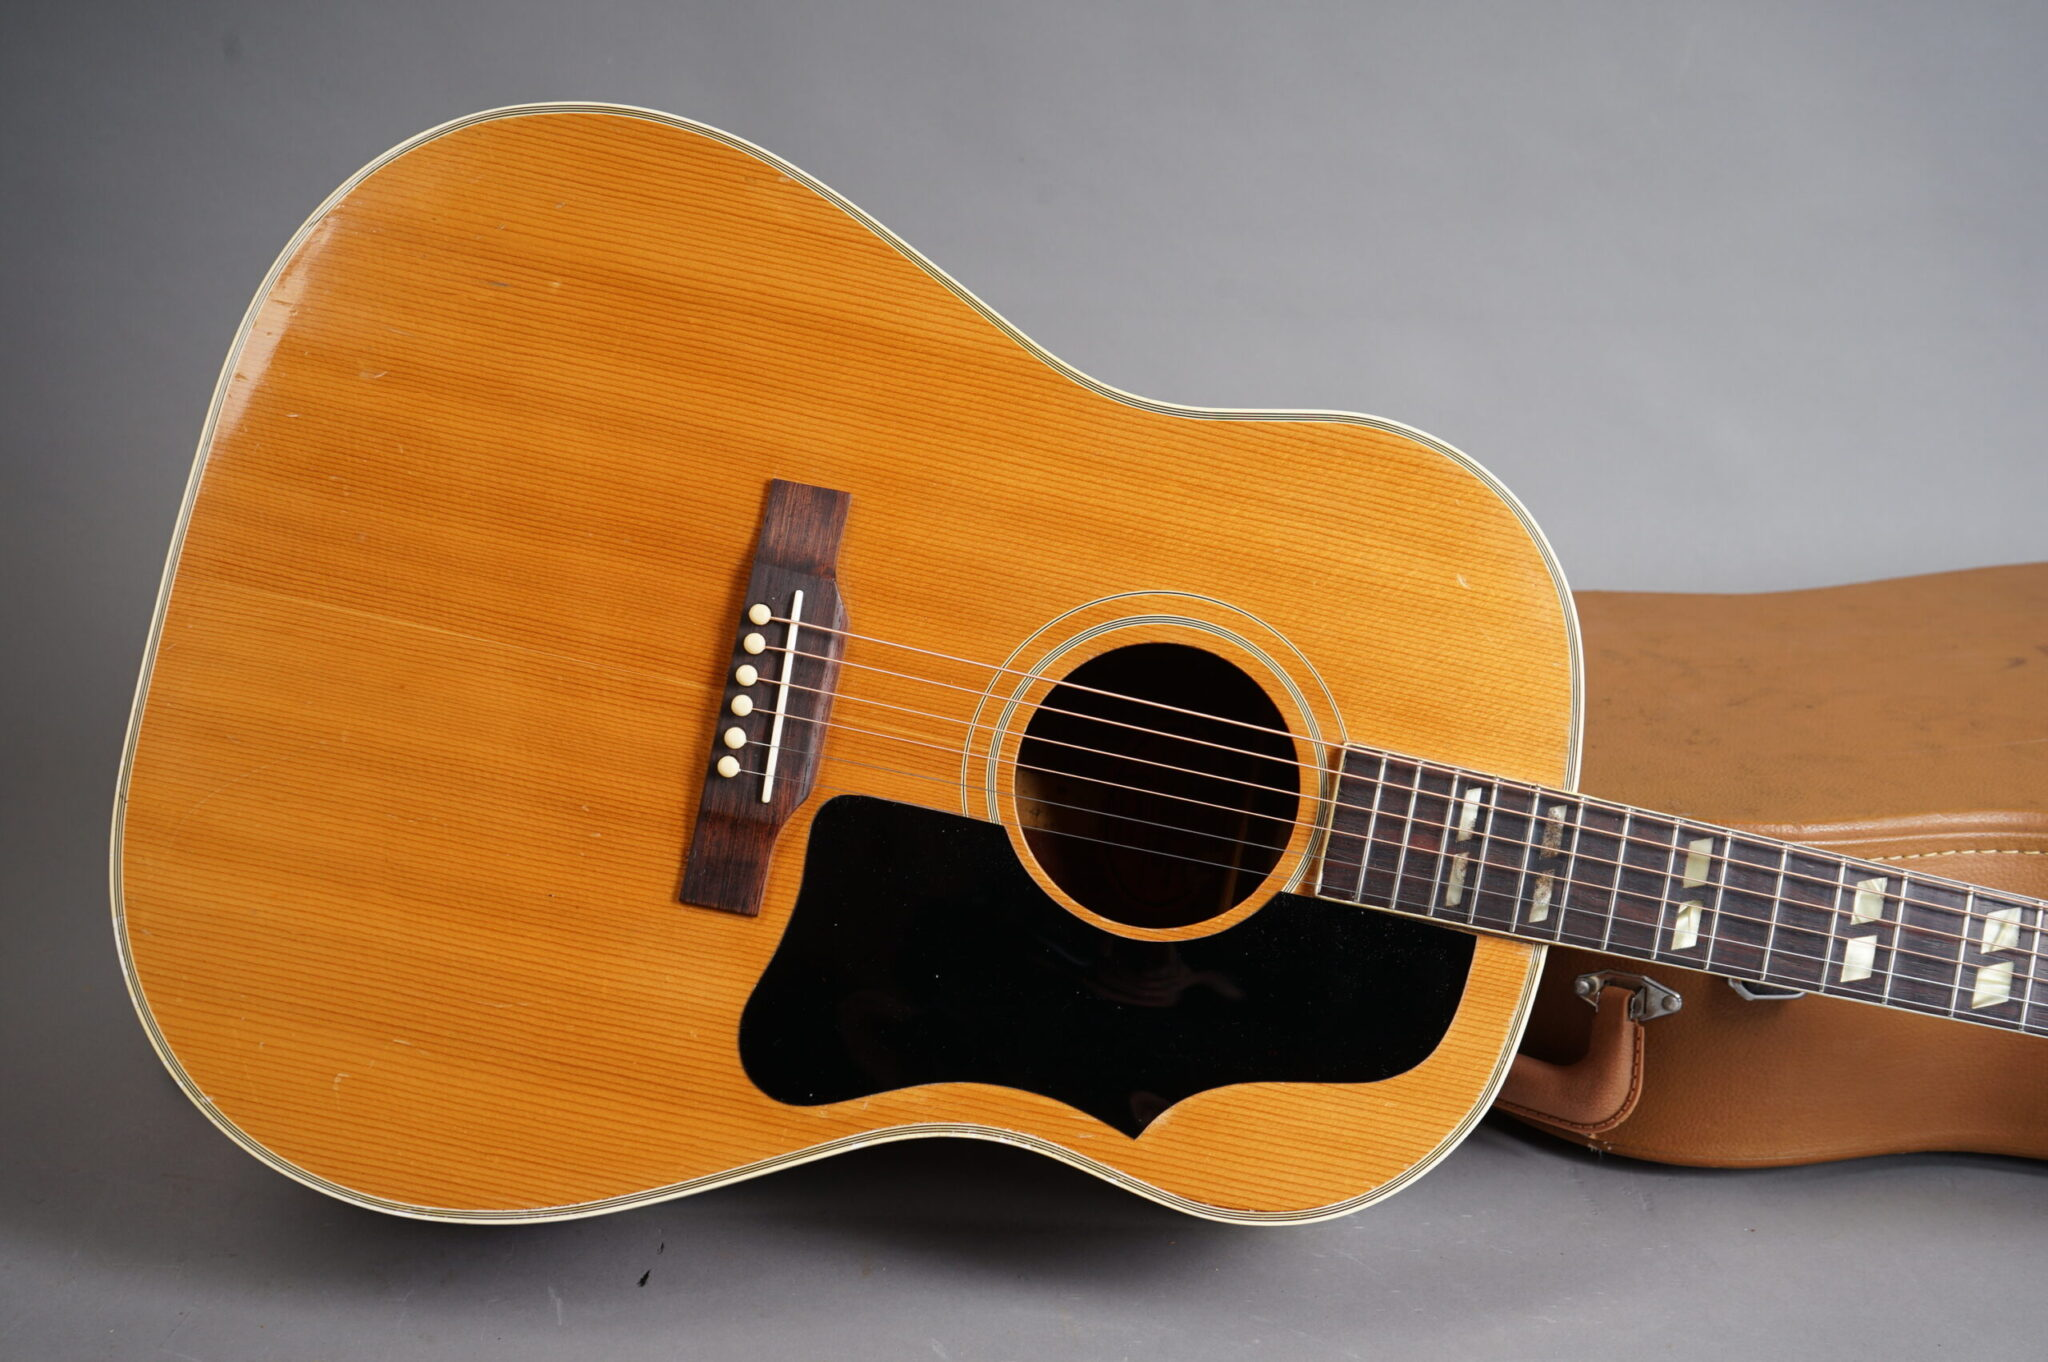 https://guitarpoint.de/app/uploads/products/1955-gibson-country-western-natural/1955-Gibson-Country-Western_A20767-7-scaled-2048x1362.jpg